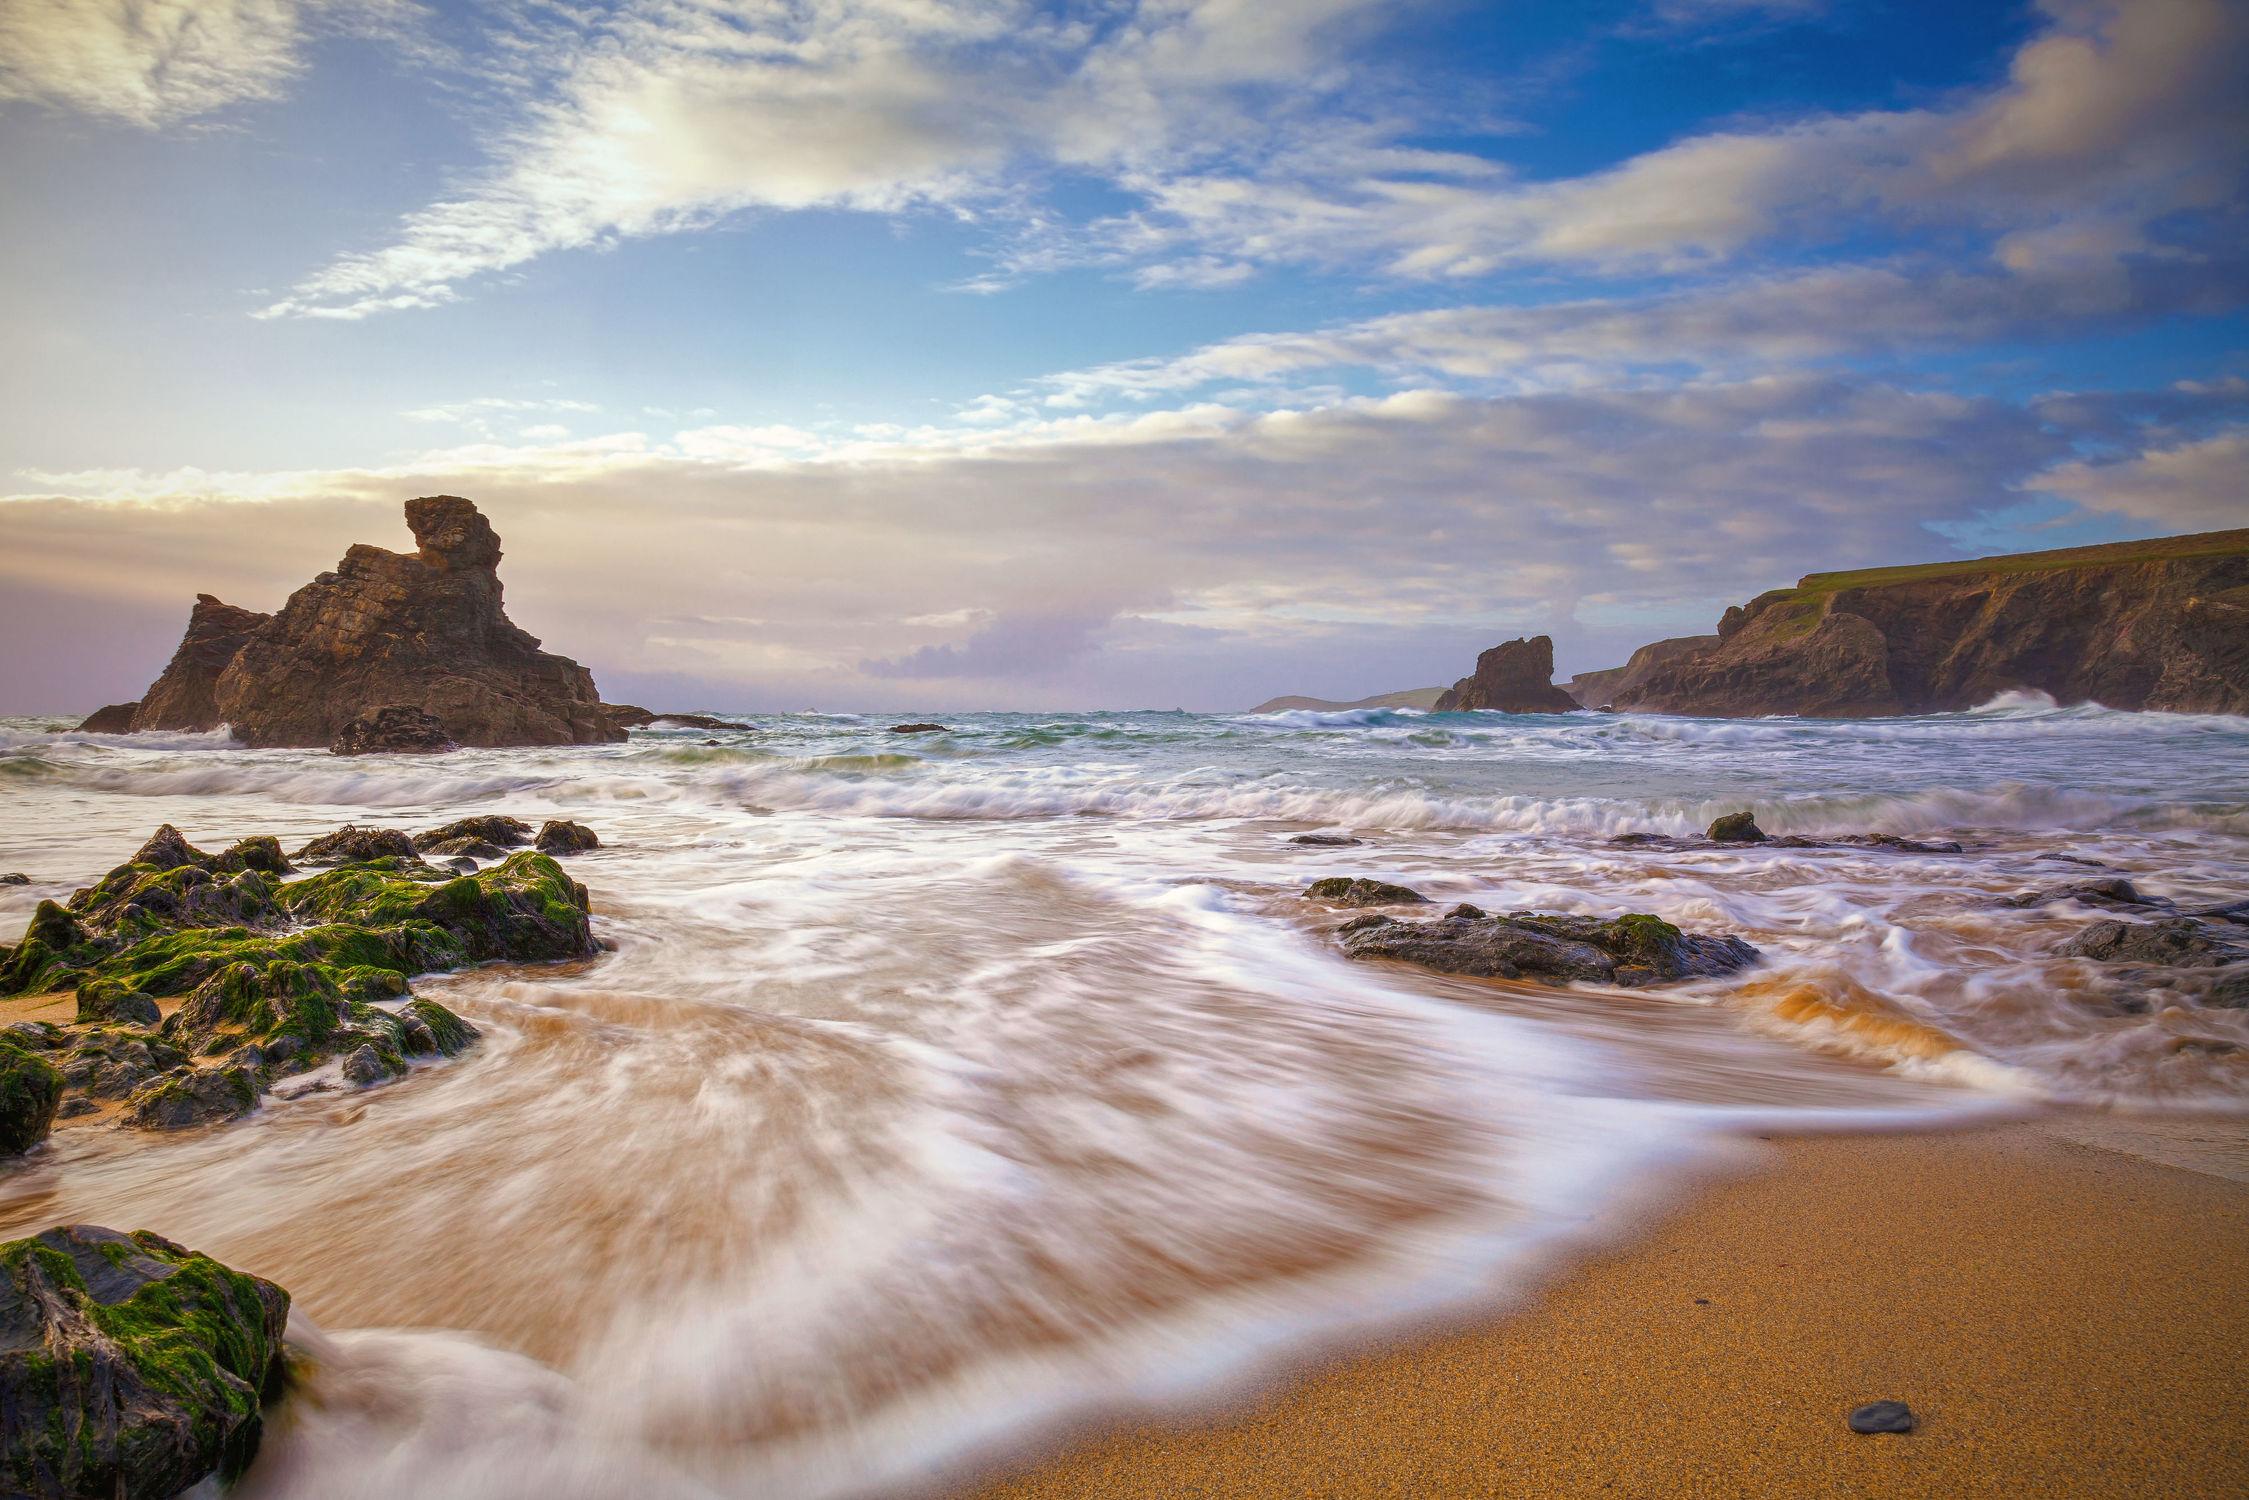 Bild mit Natur, Natur, Wasser, Gewässer, Felsen, Wellen, Sonnenuntergang, Sonnenaufgang, Am Meer, ozean